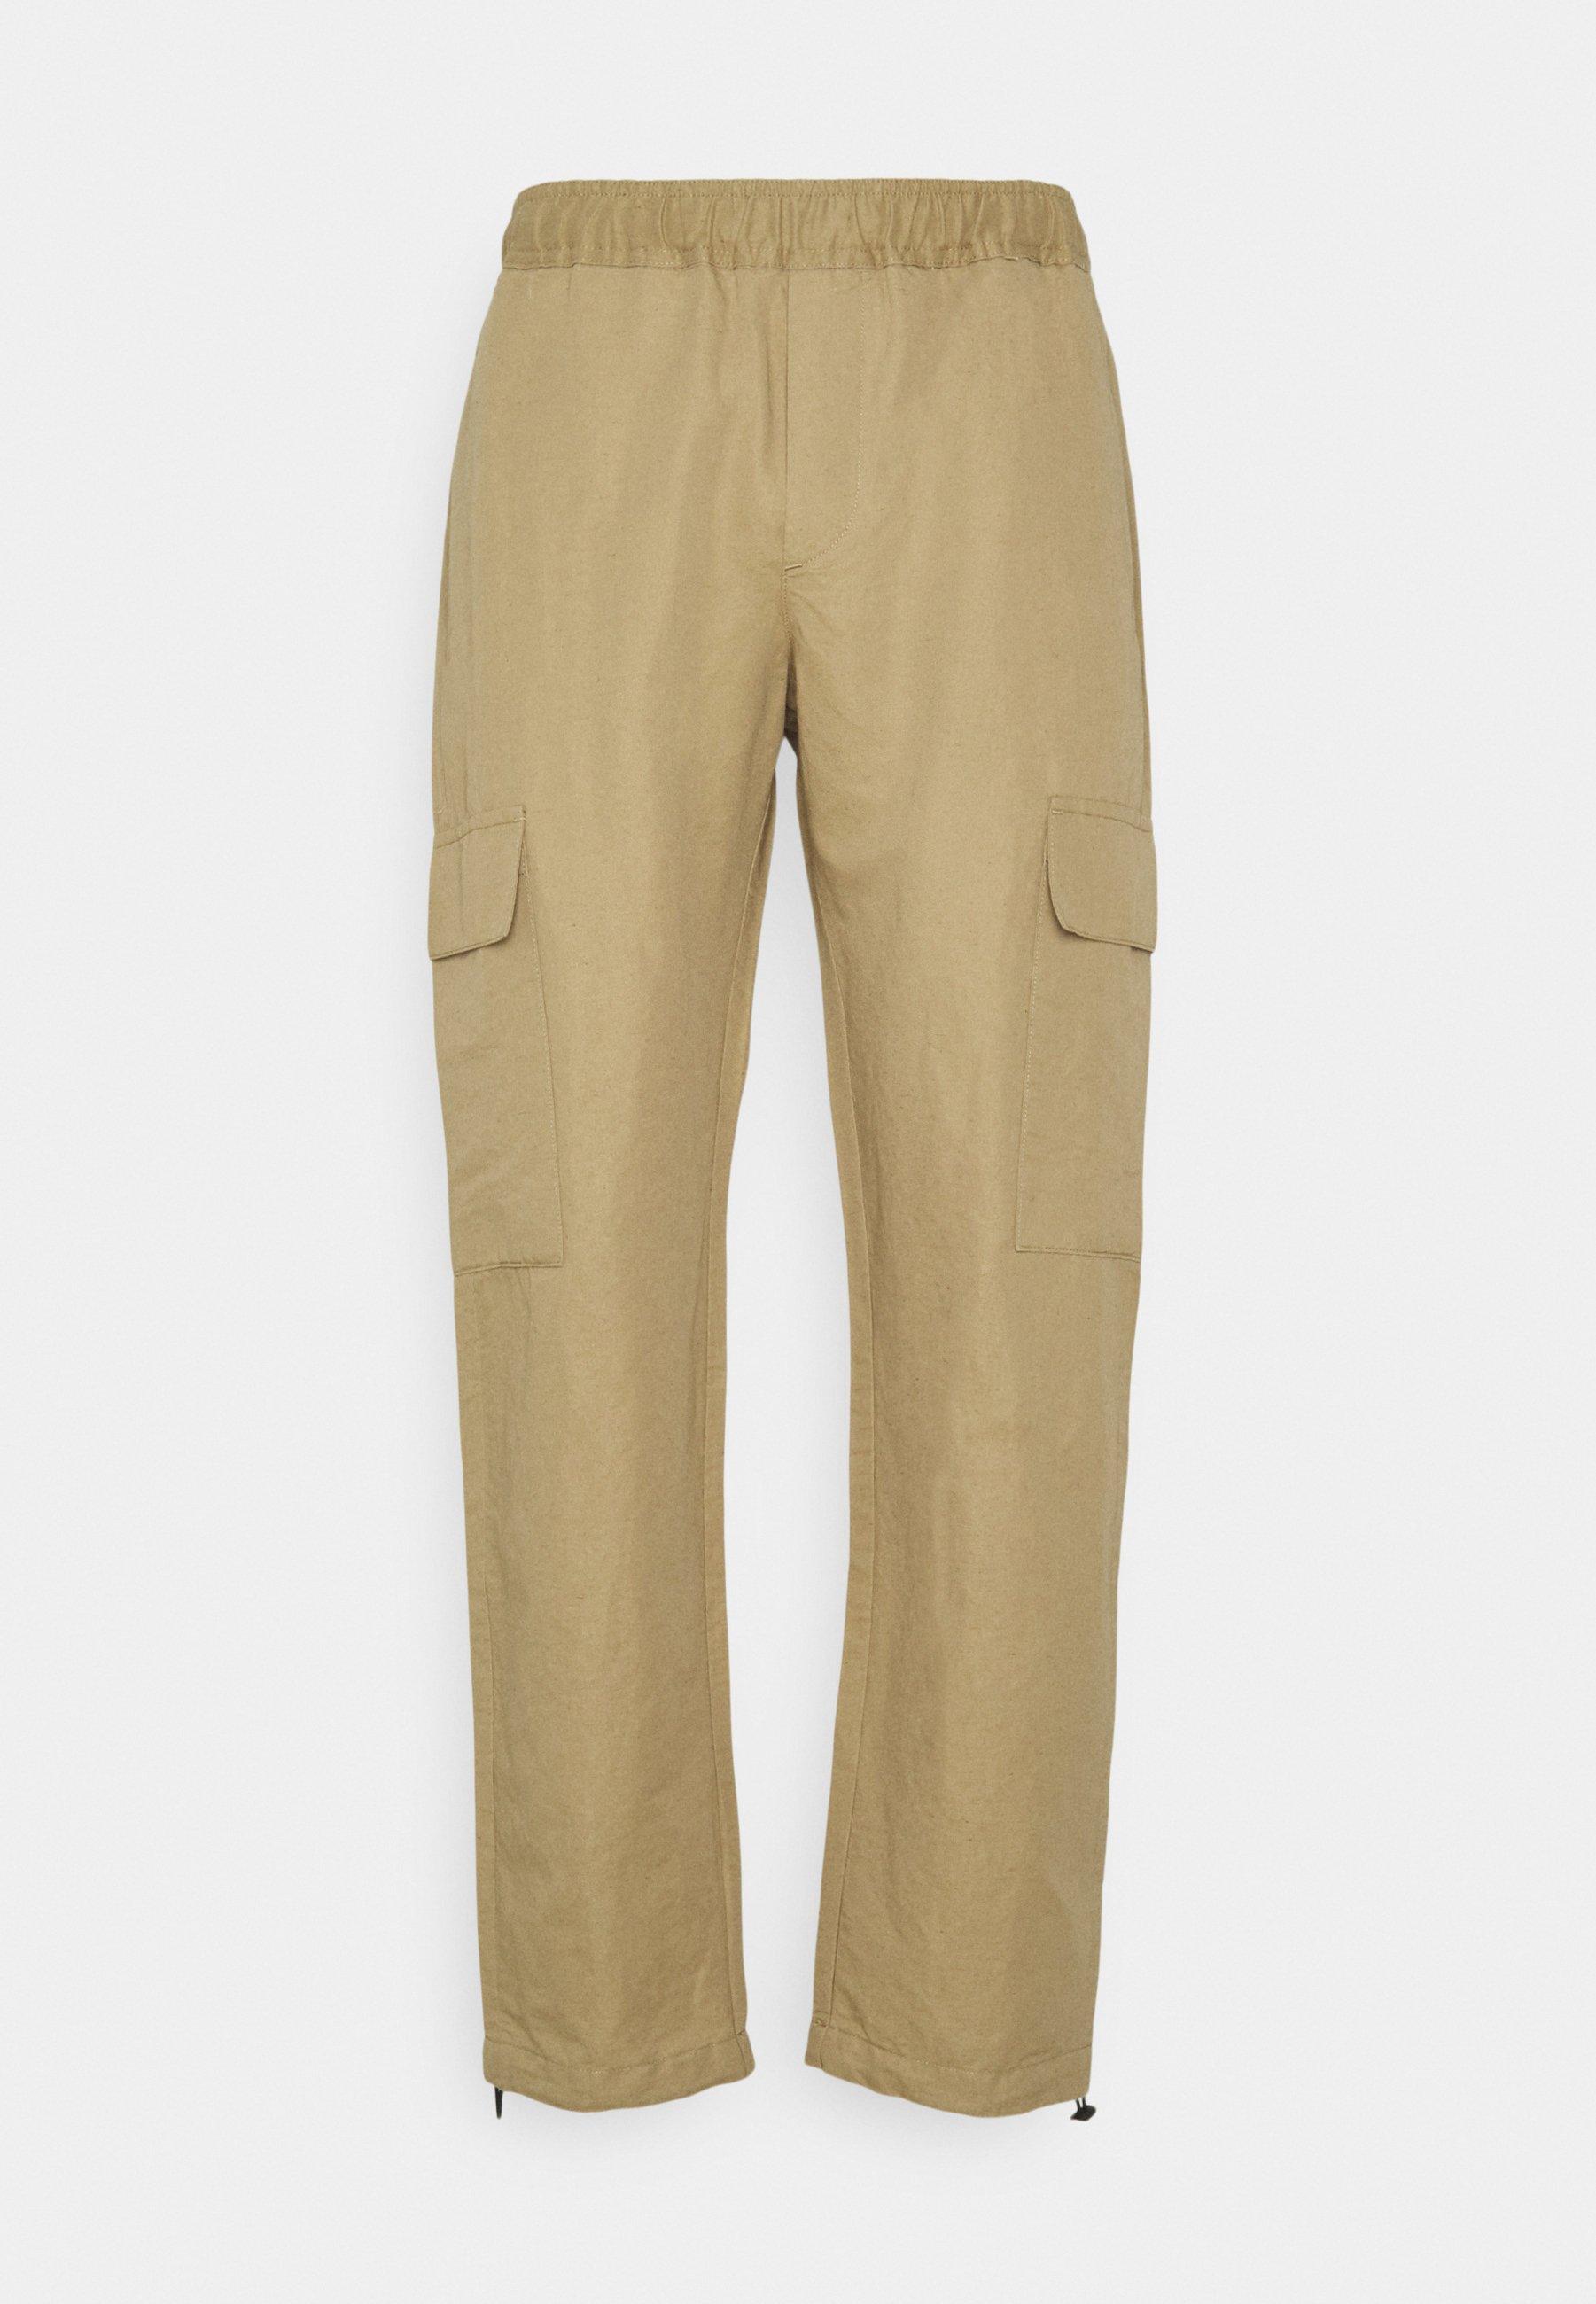 Homme FRAIL LOORIX PANT - Pantalon cargo